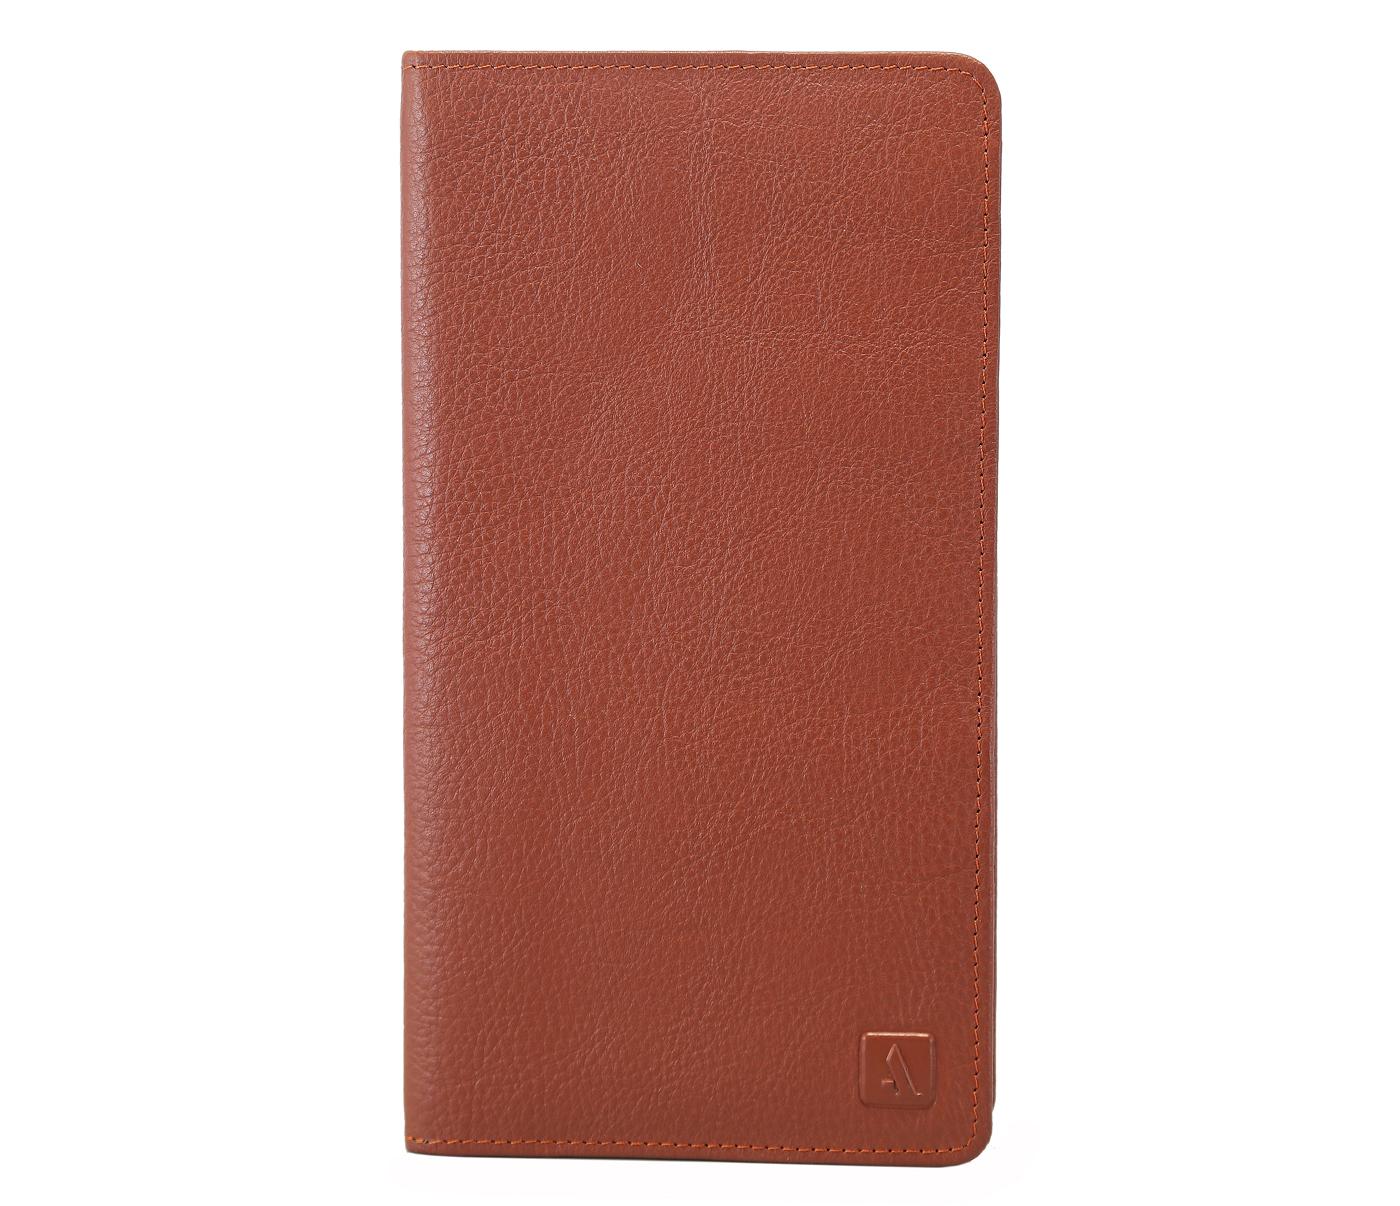 W85-Rafel -Travel document wallet in Genuine Leather - Tan